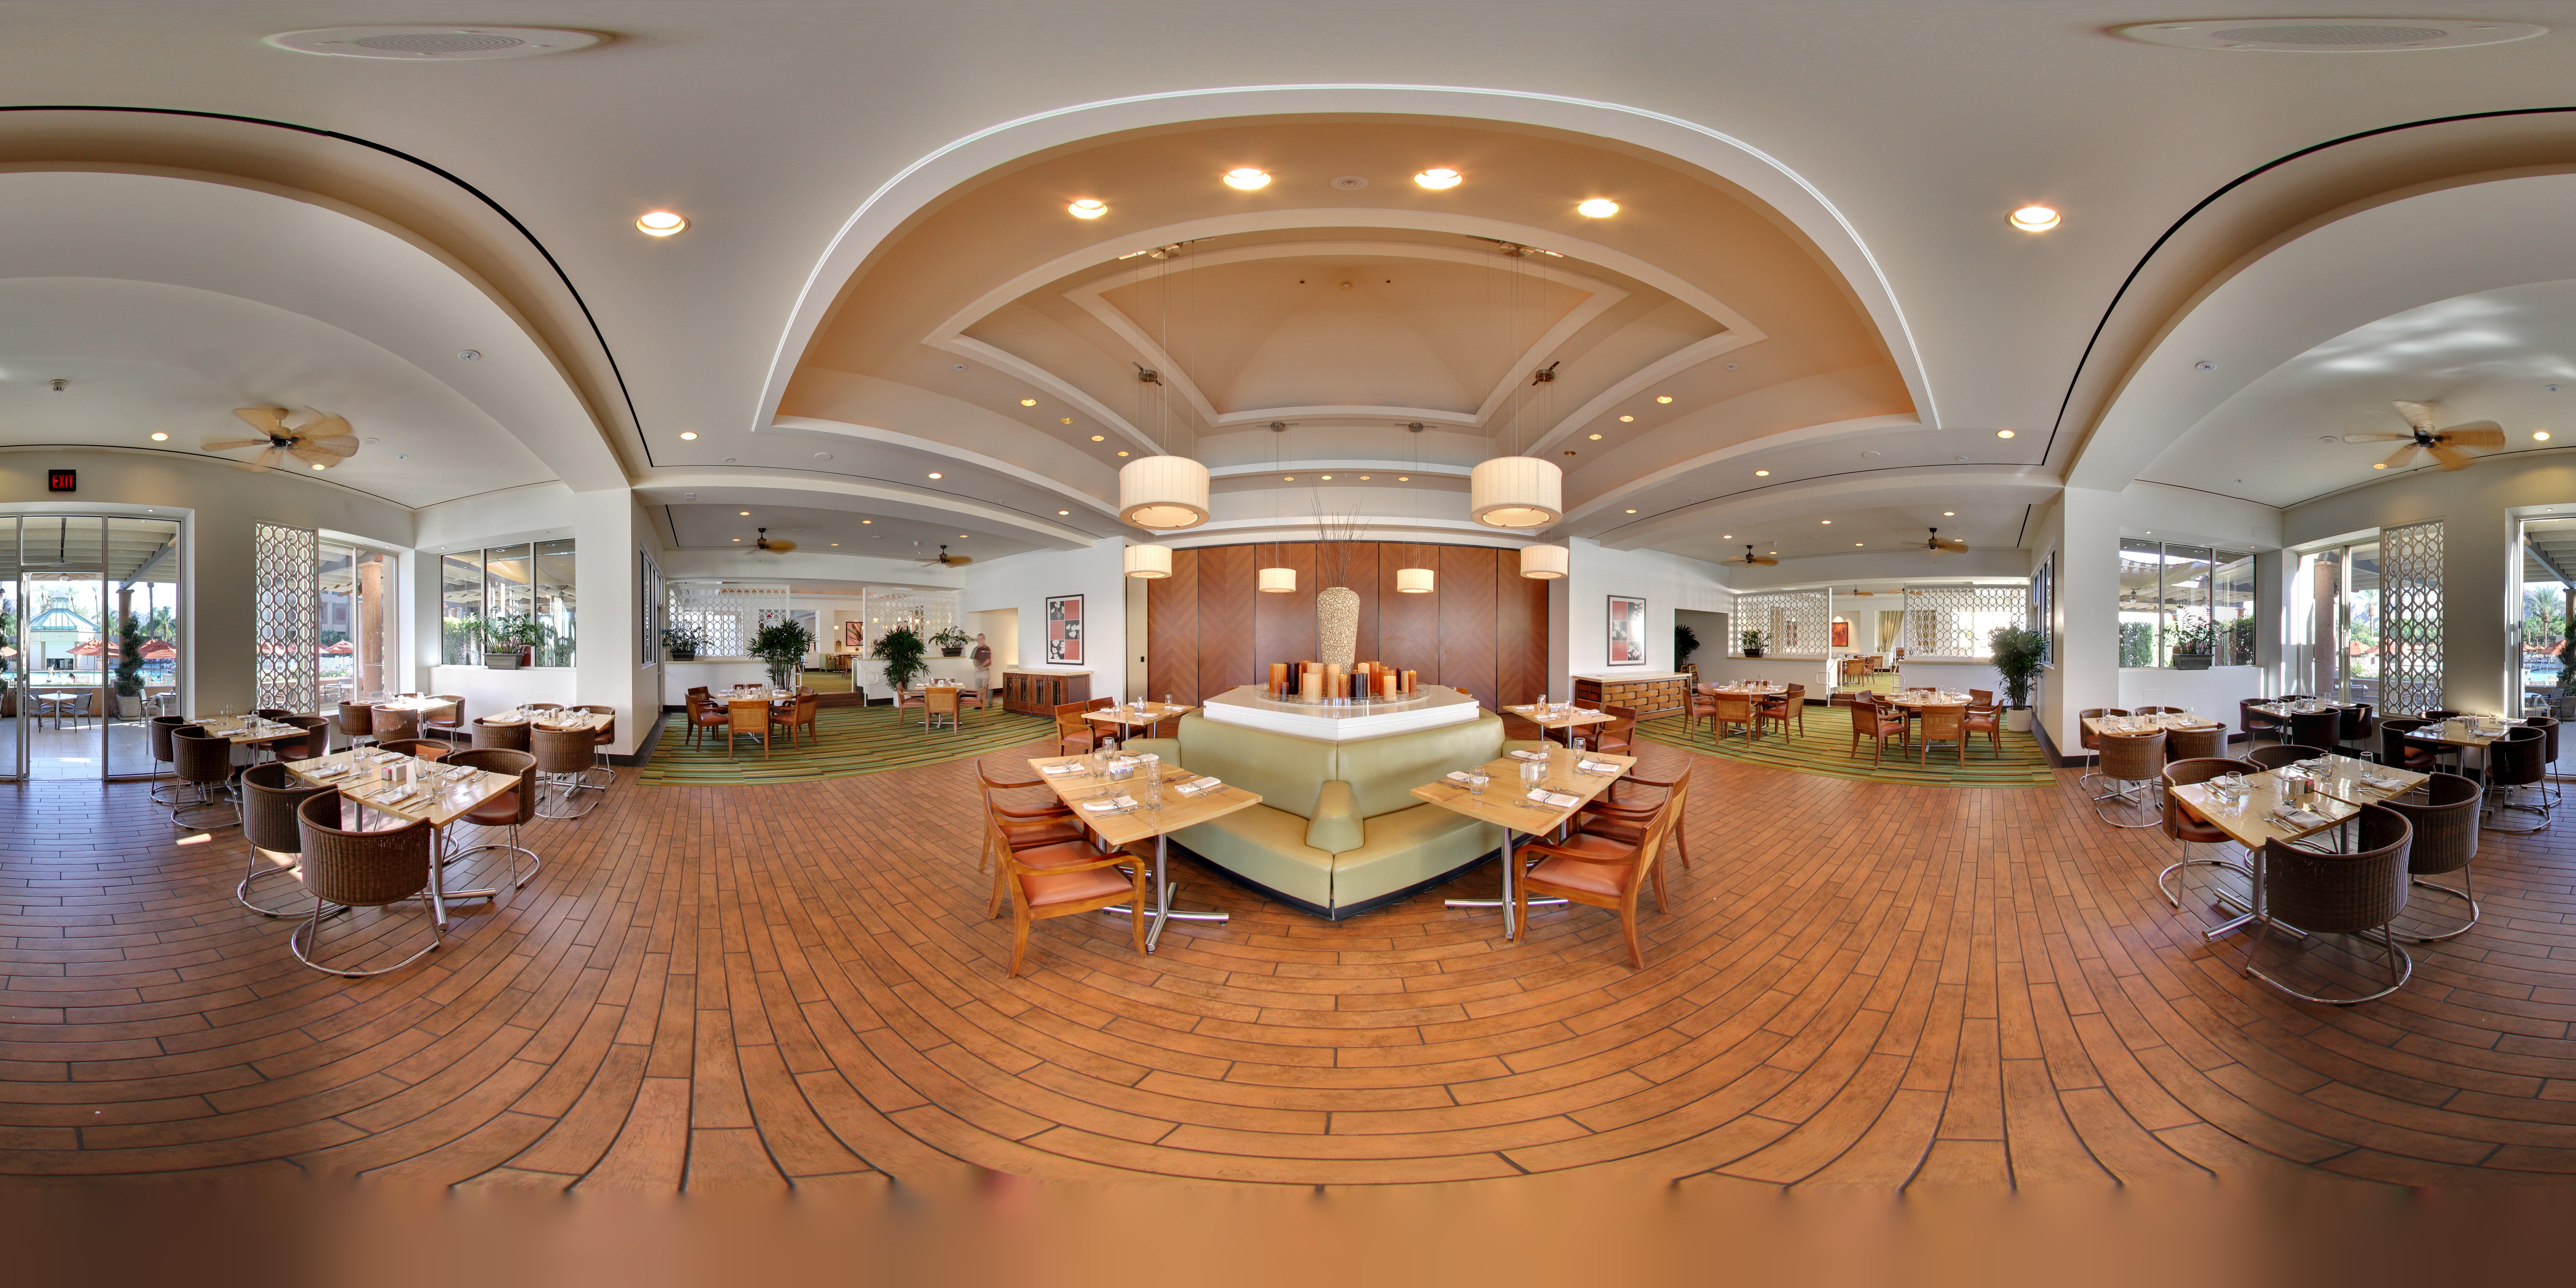 Renaissance Indian Wells Resort & Spa image 15